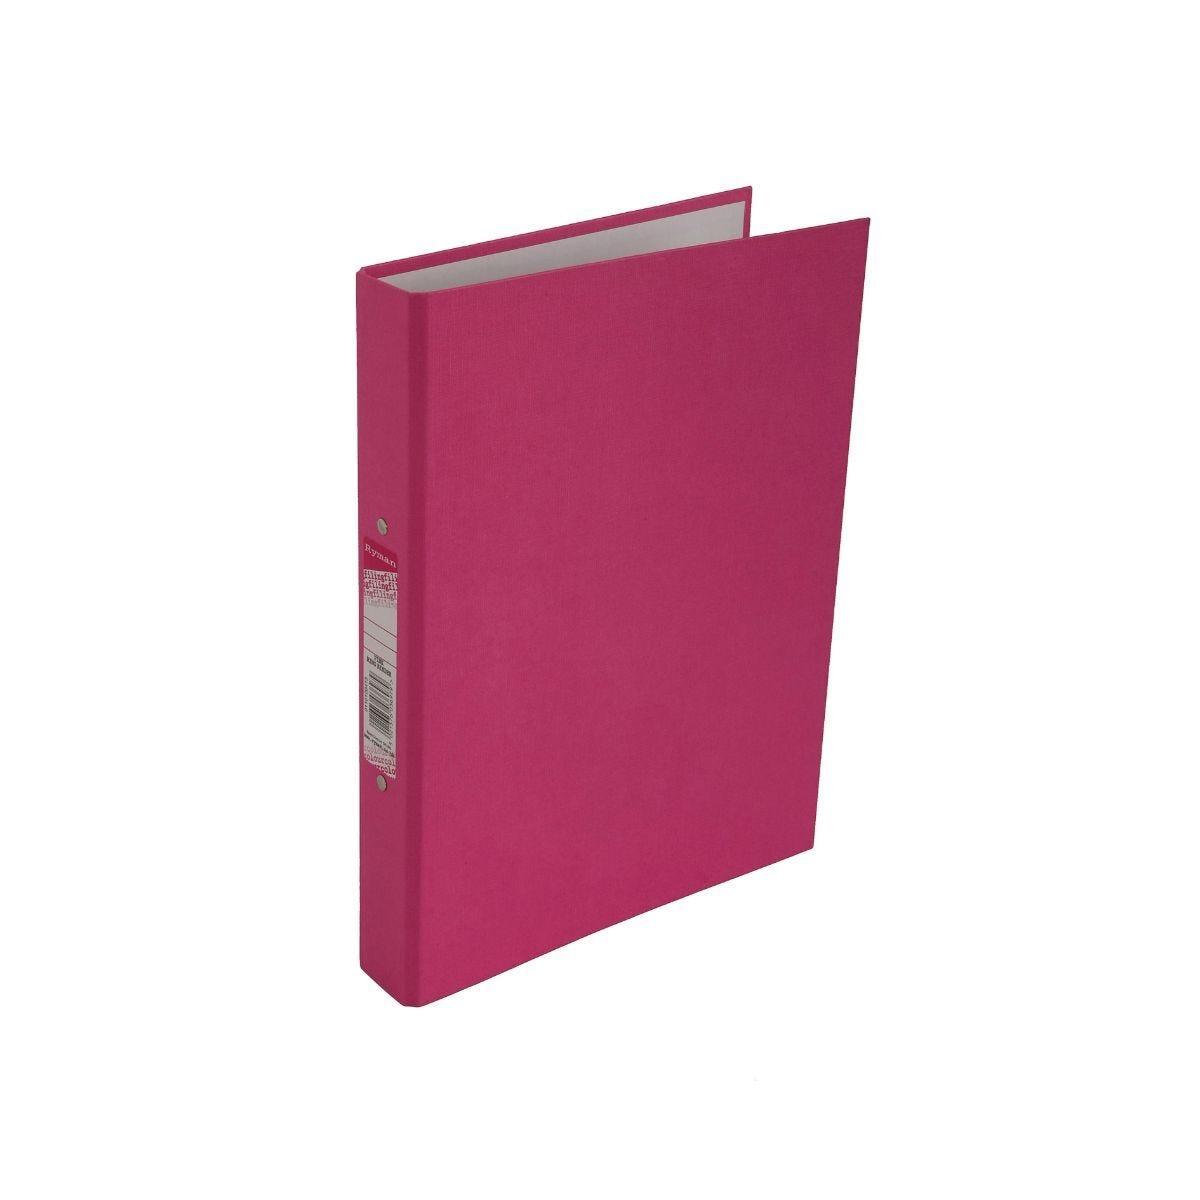 Ryman Colour Ring Binder A4 Pink